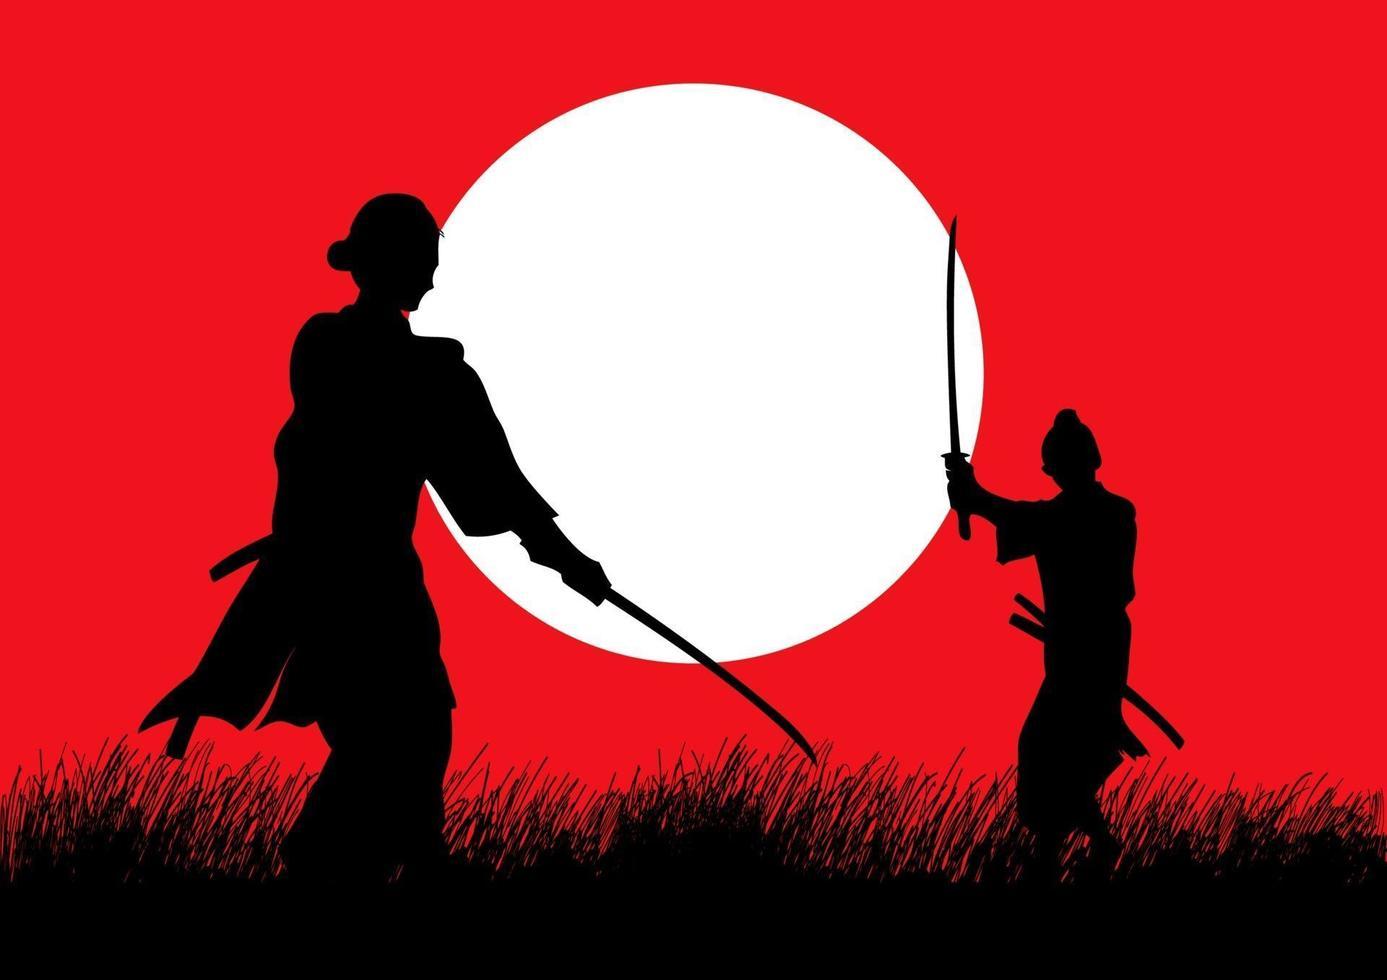 twee samurai in duelhouding tegenover elkaar op grasveld vector